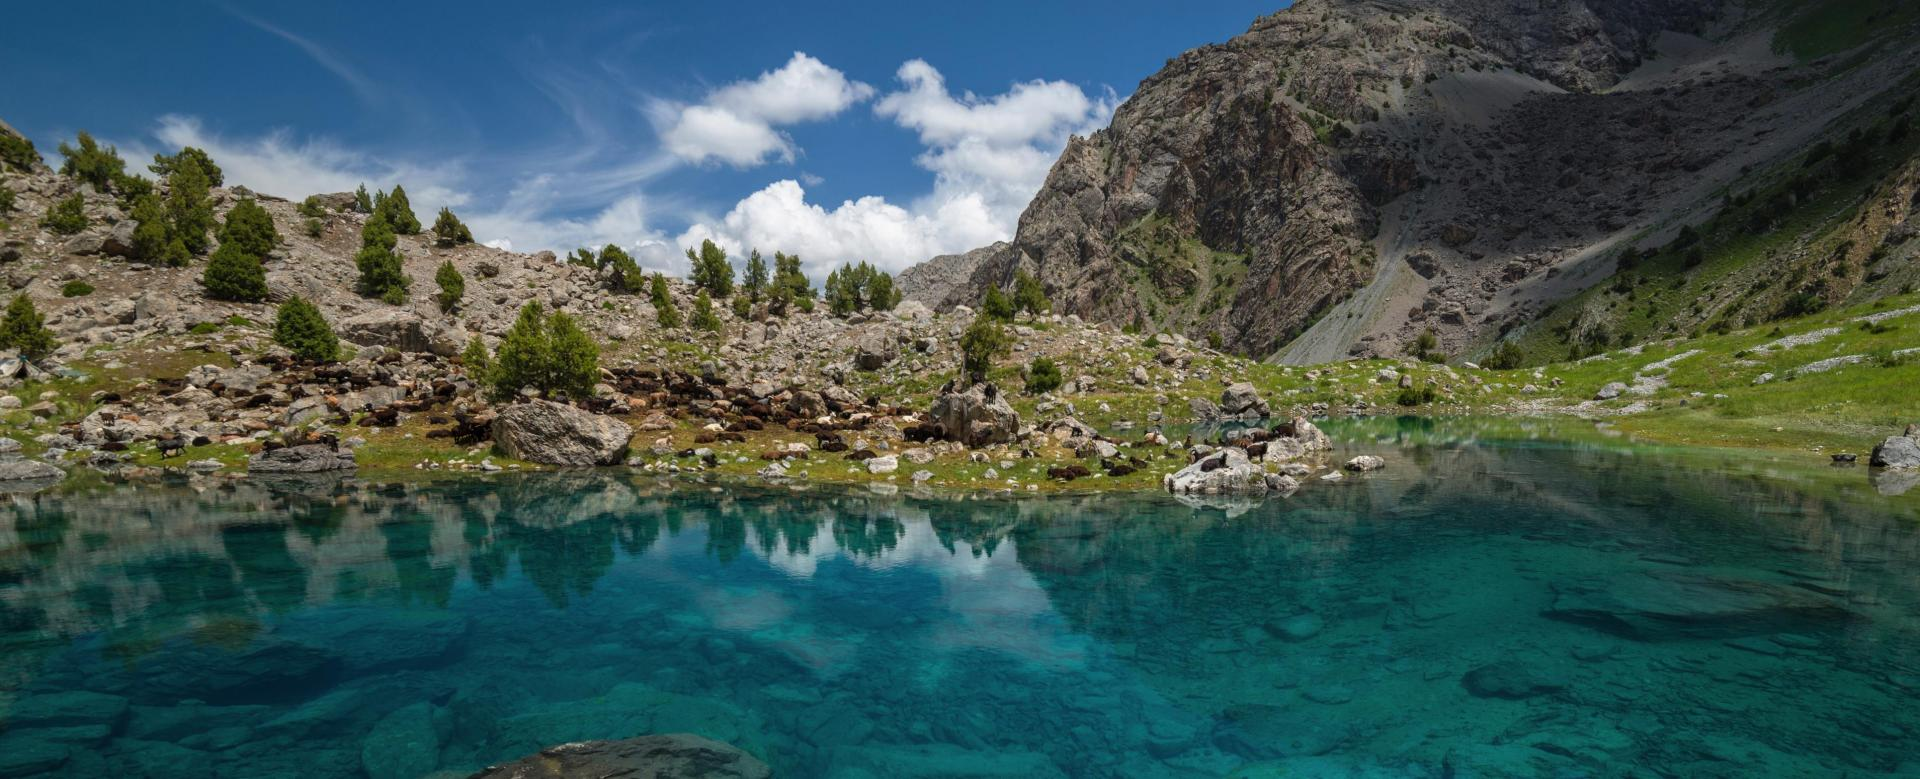 Voyage à pied Tadjikistan : Les monts fanskye